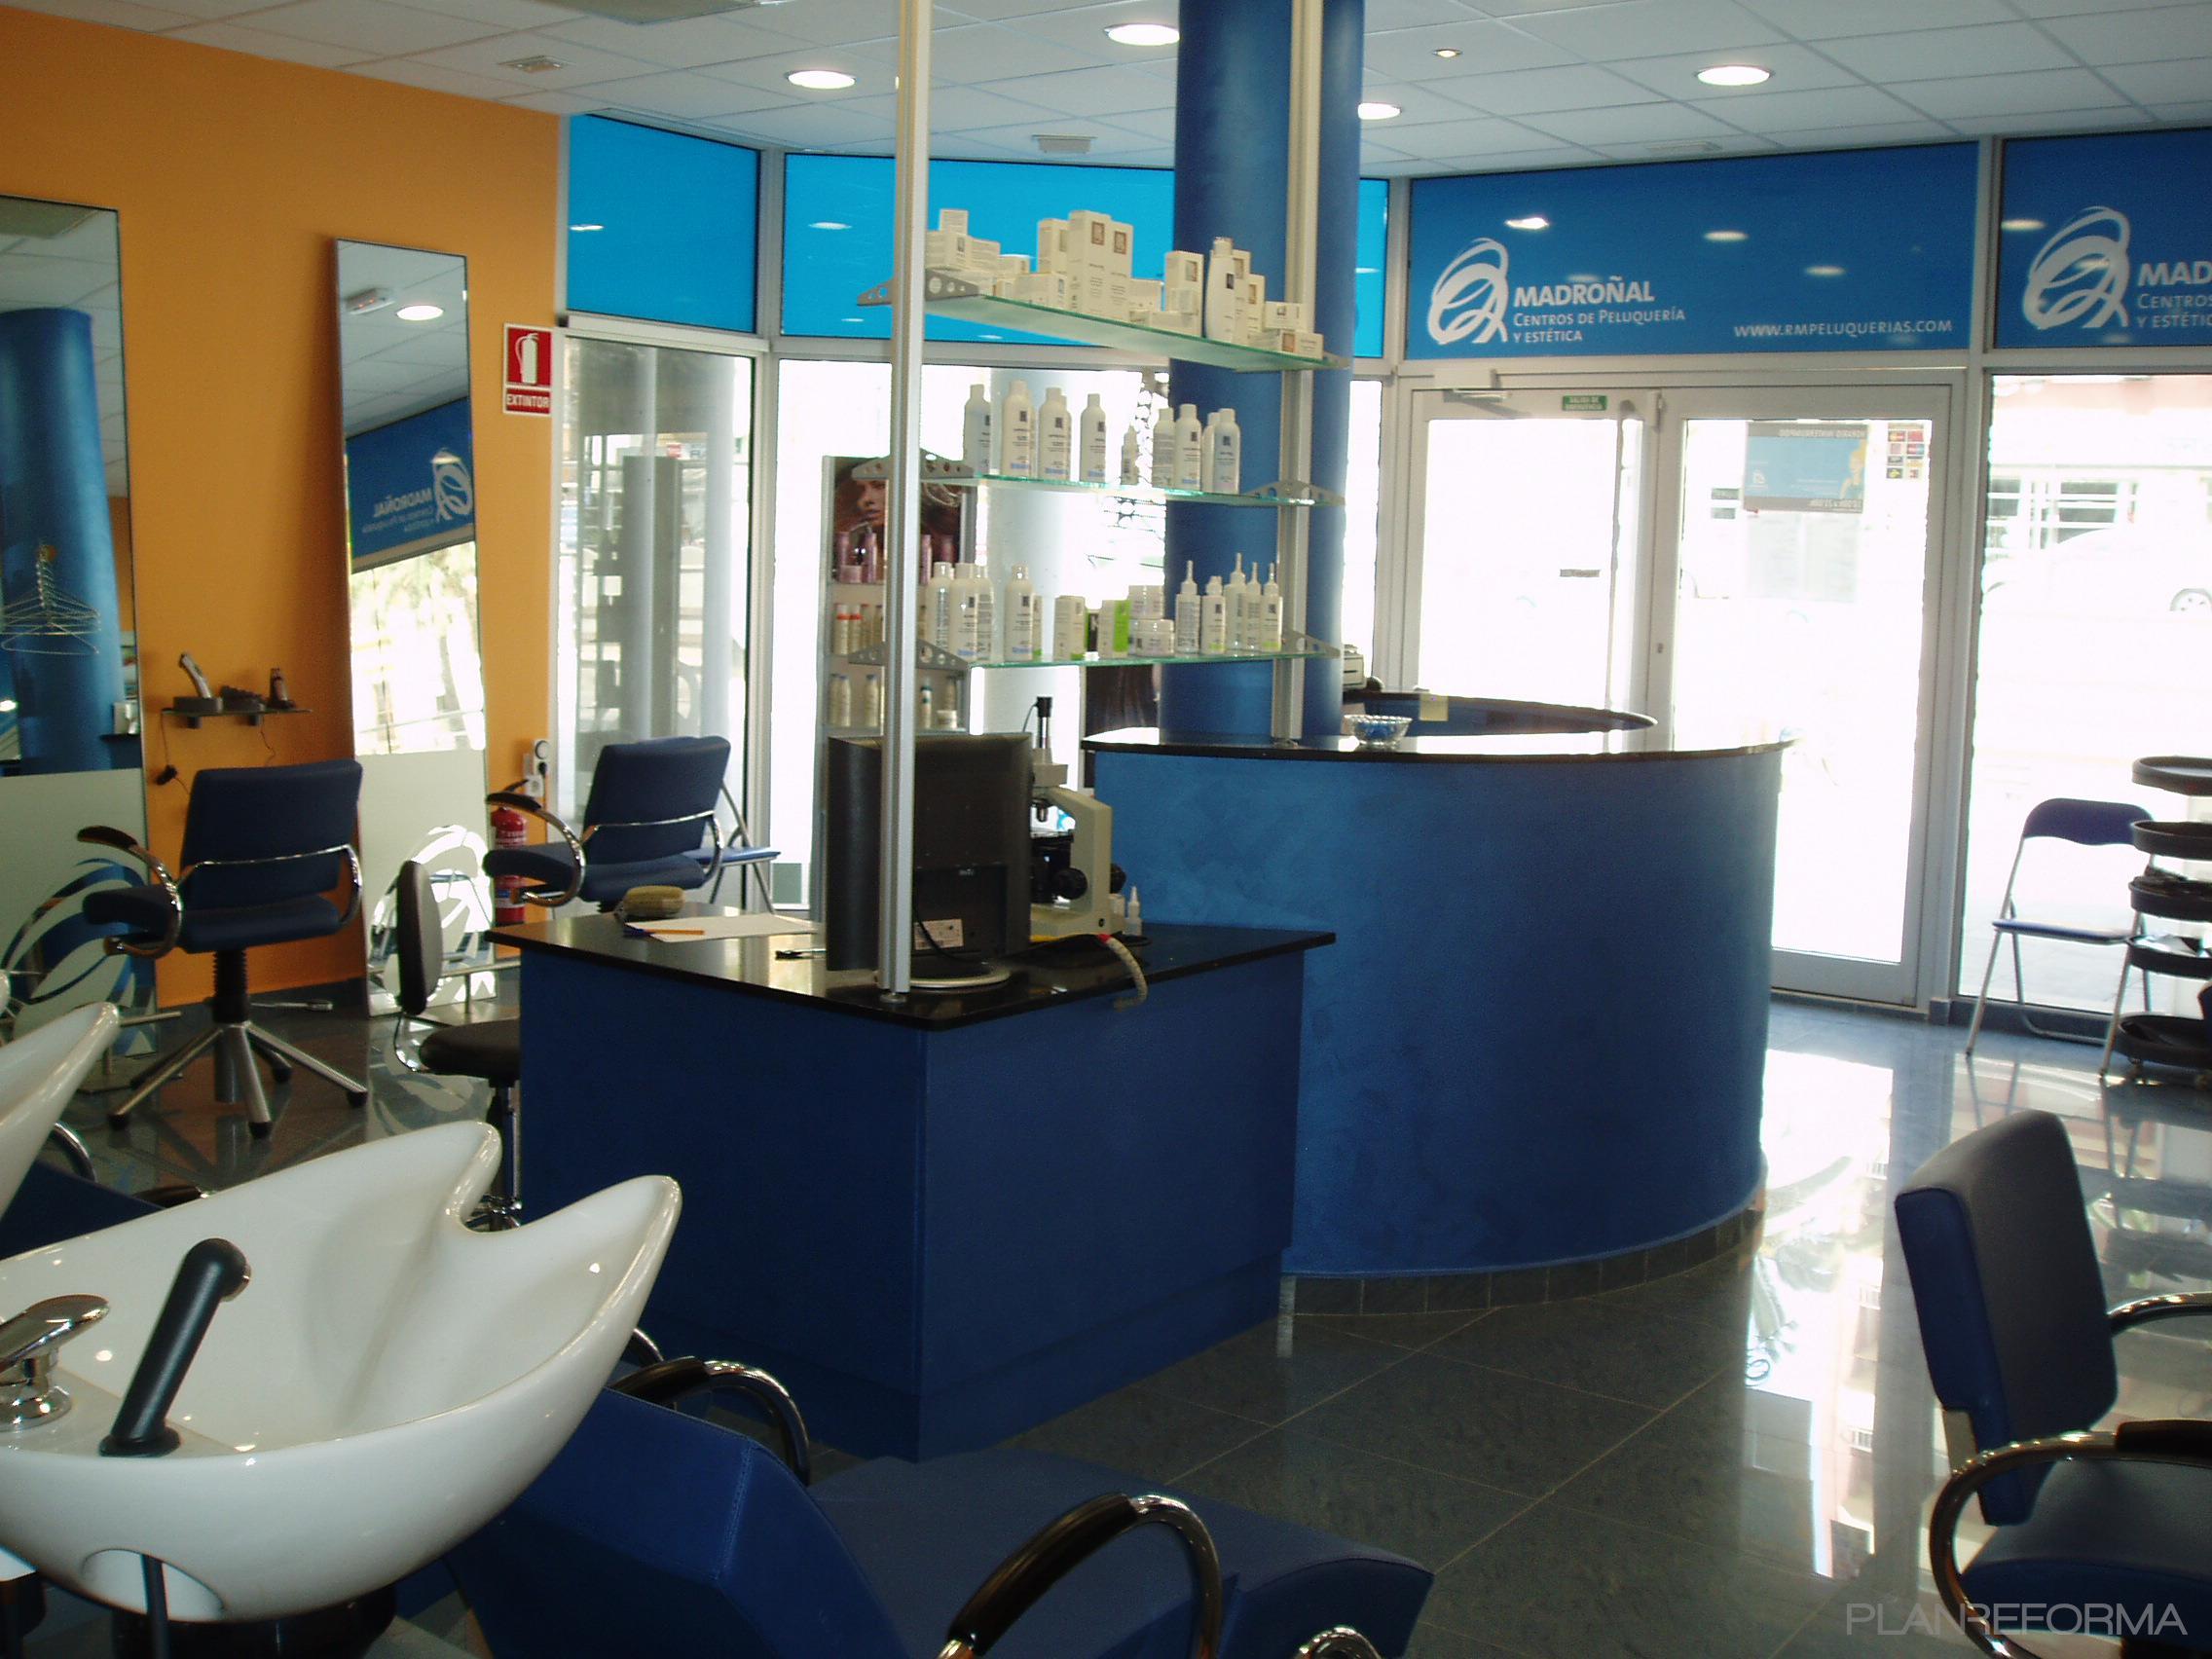 Salón de belleza style contemporaneo color ocre, azul, negro